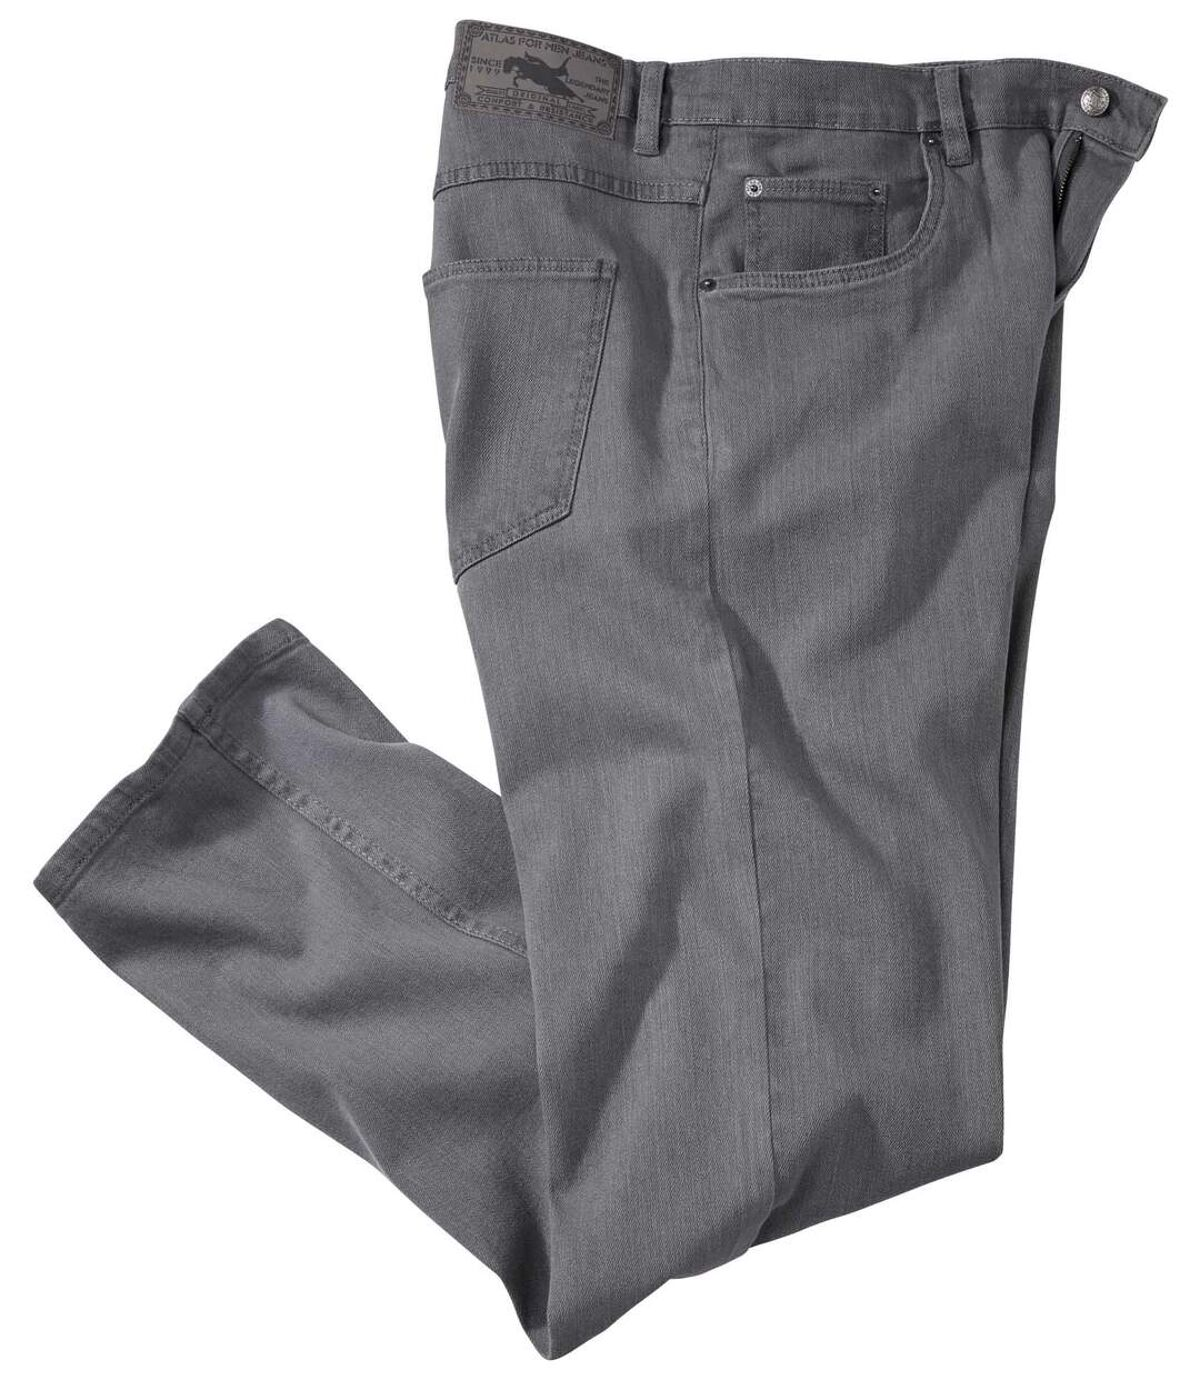 Jeans Stretch Grey Atlas For Men